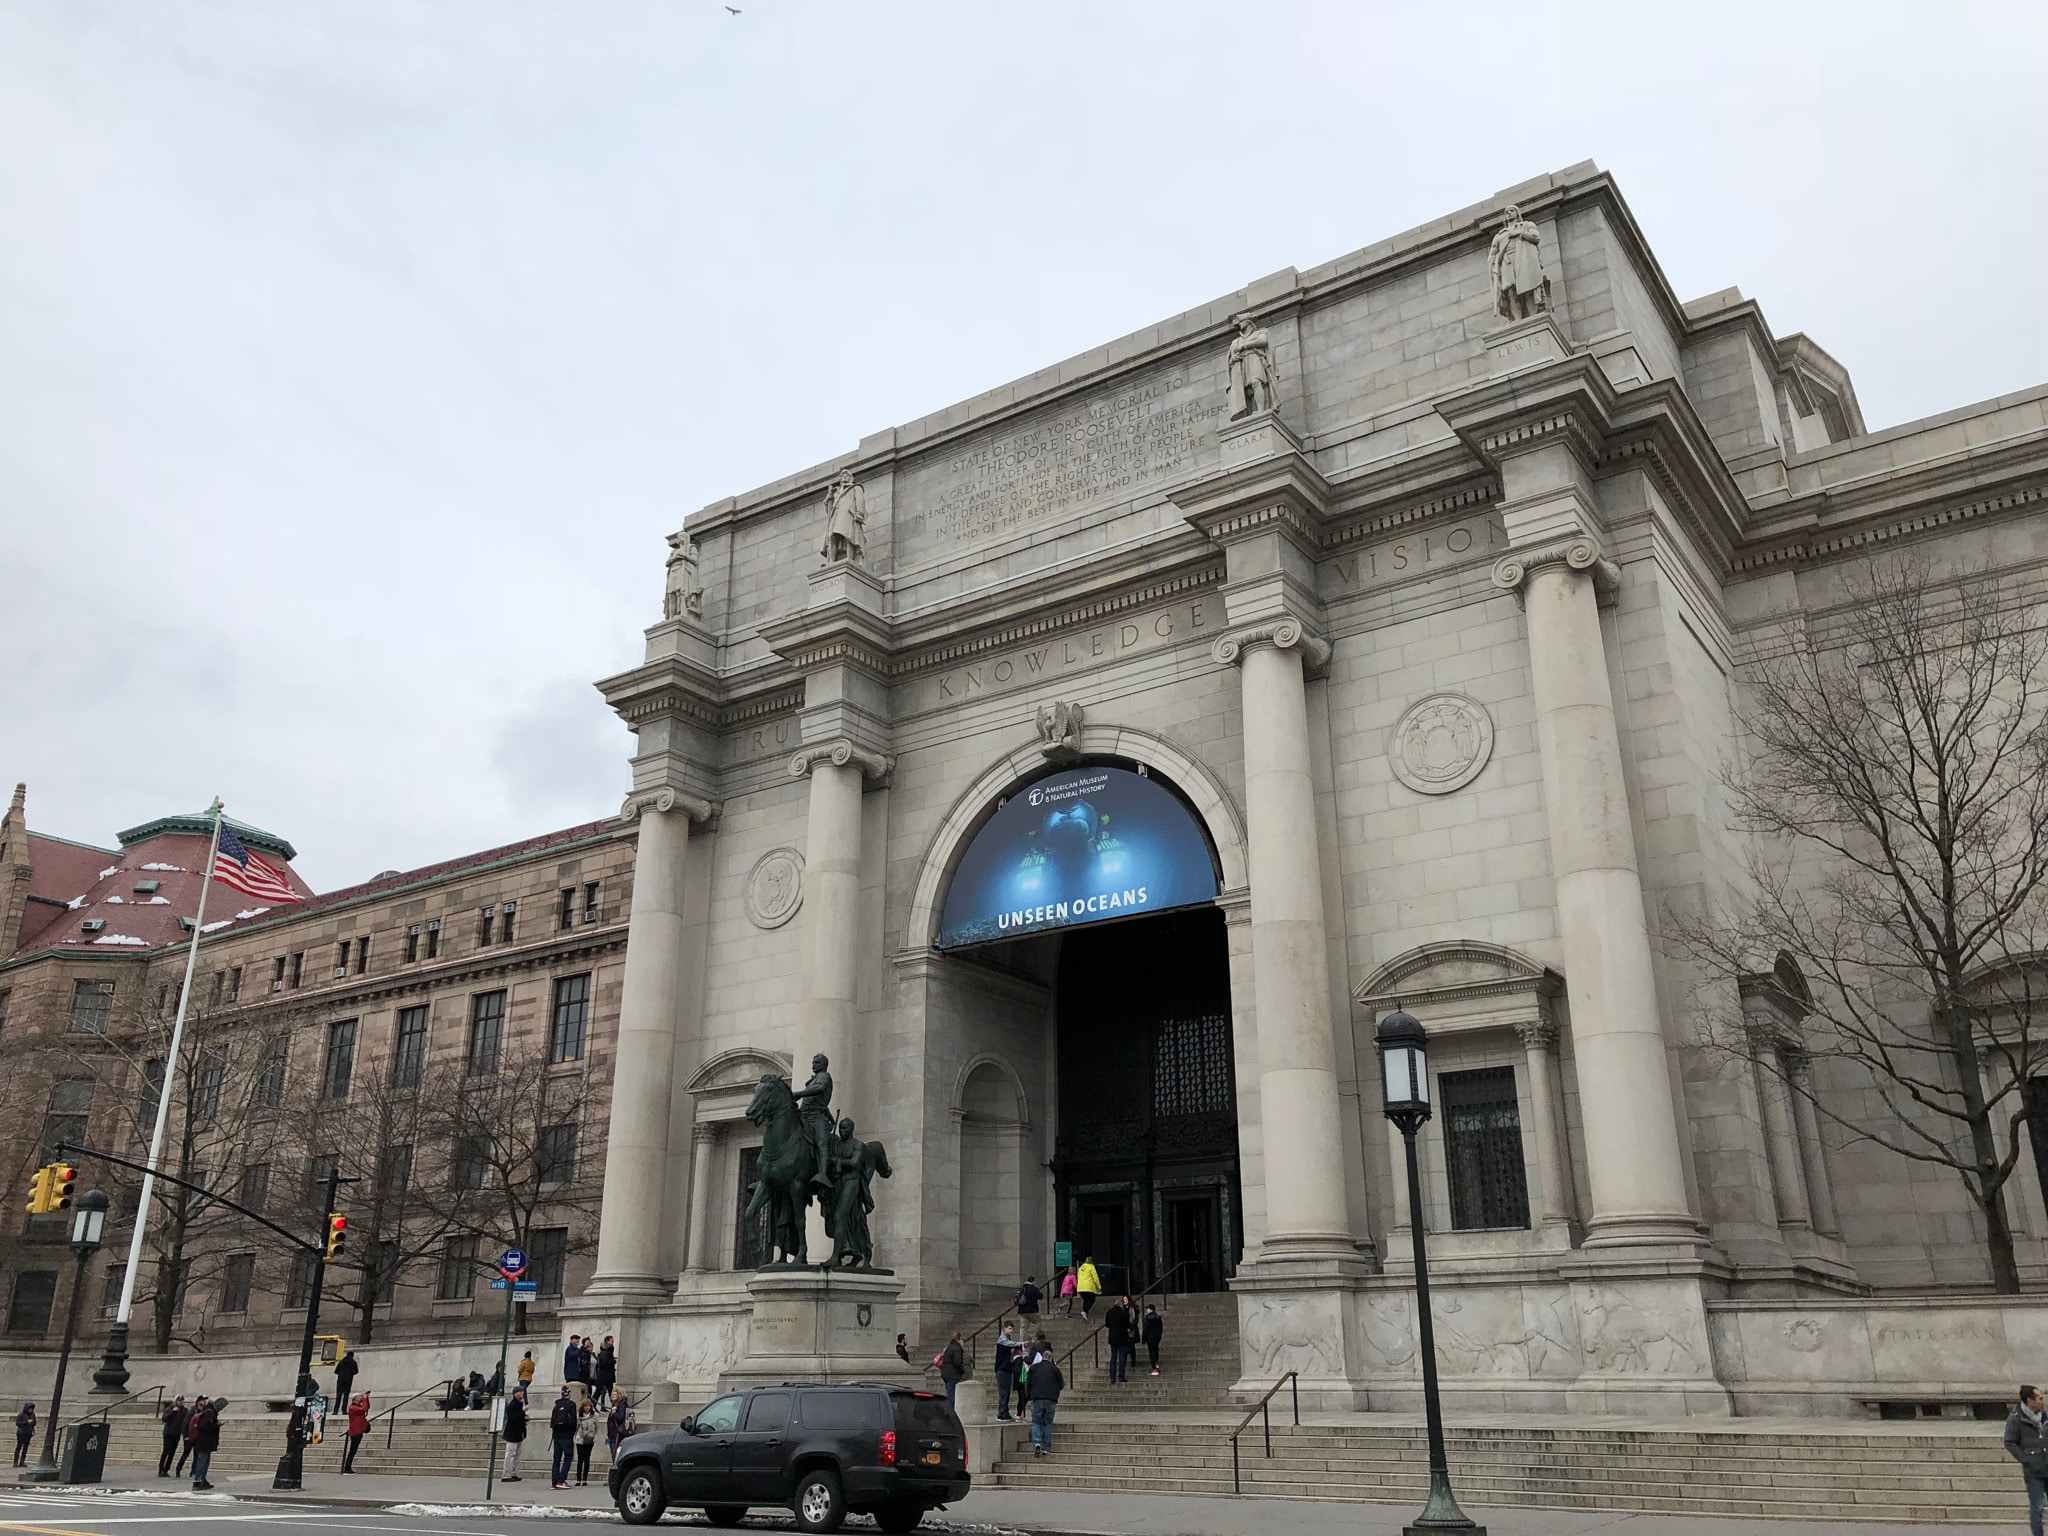 muséum d'Histoire naturelle de New York - American Museum of Natural History